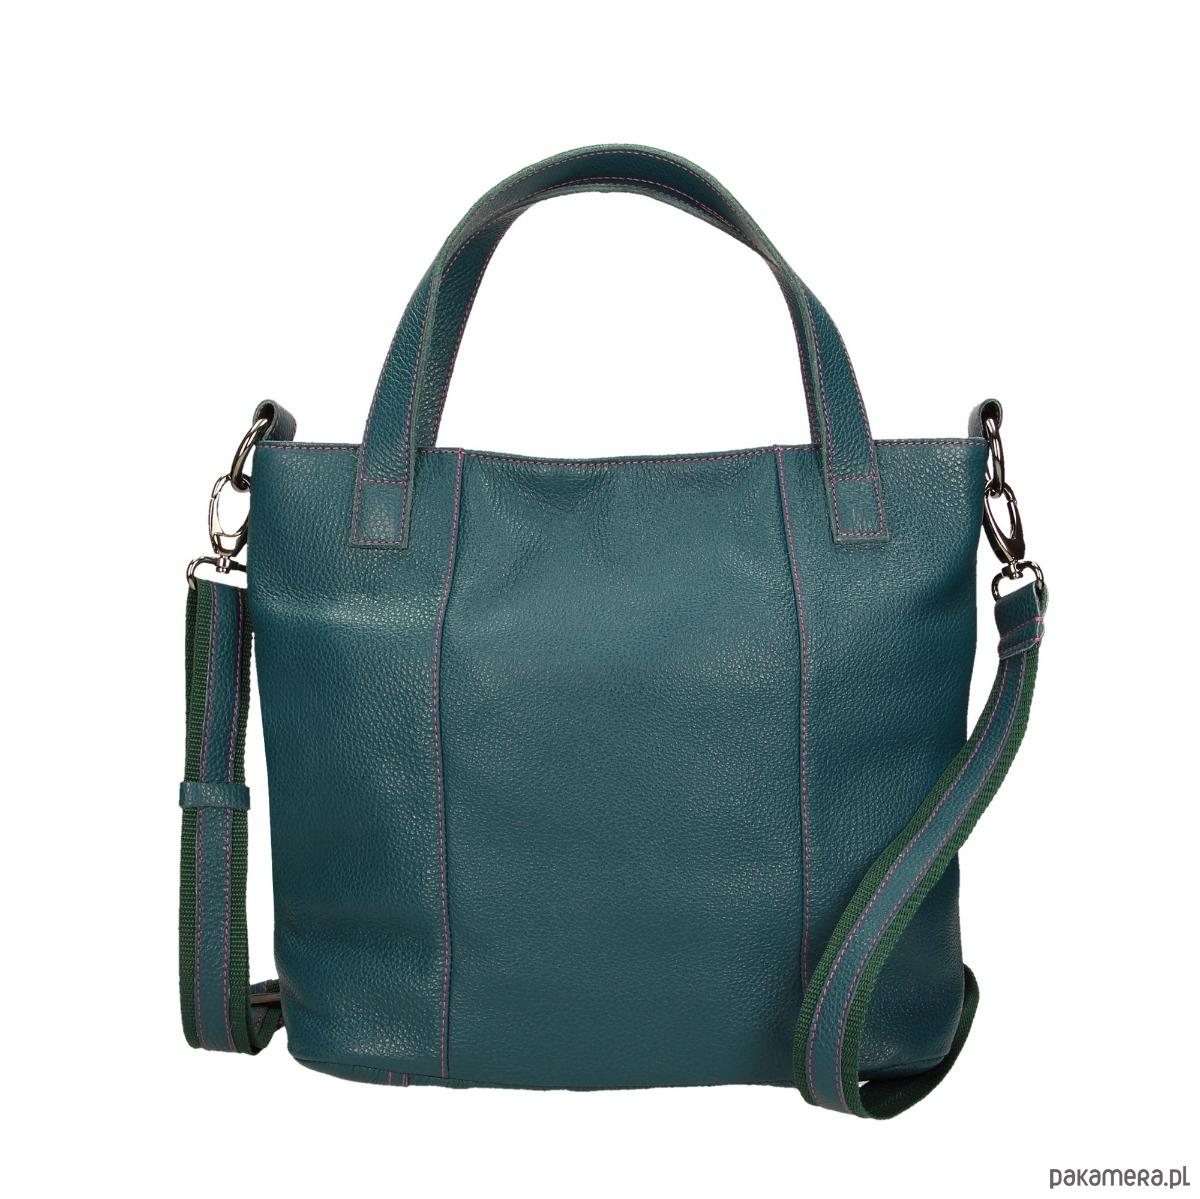 637d758a9db0a torby na ramię - damskie-Torebka skórzana zielona Avanzata M marki Bolsa